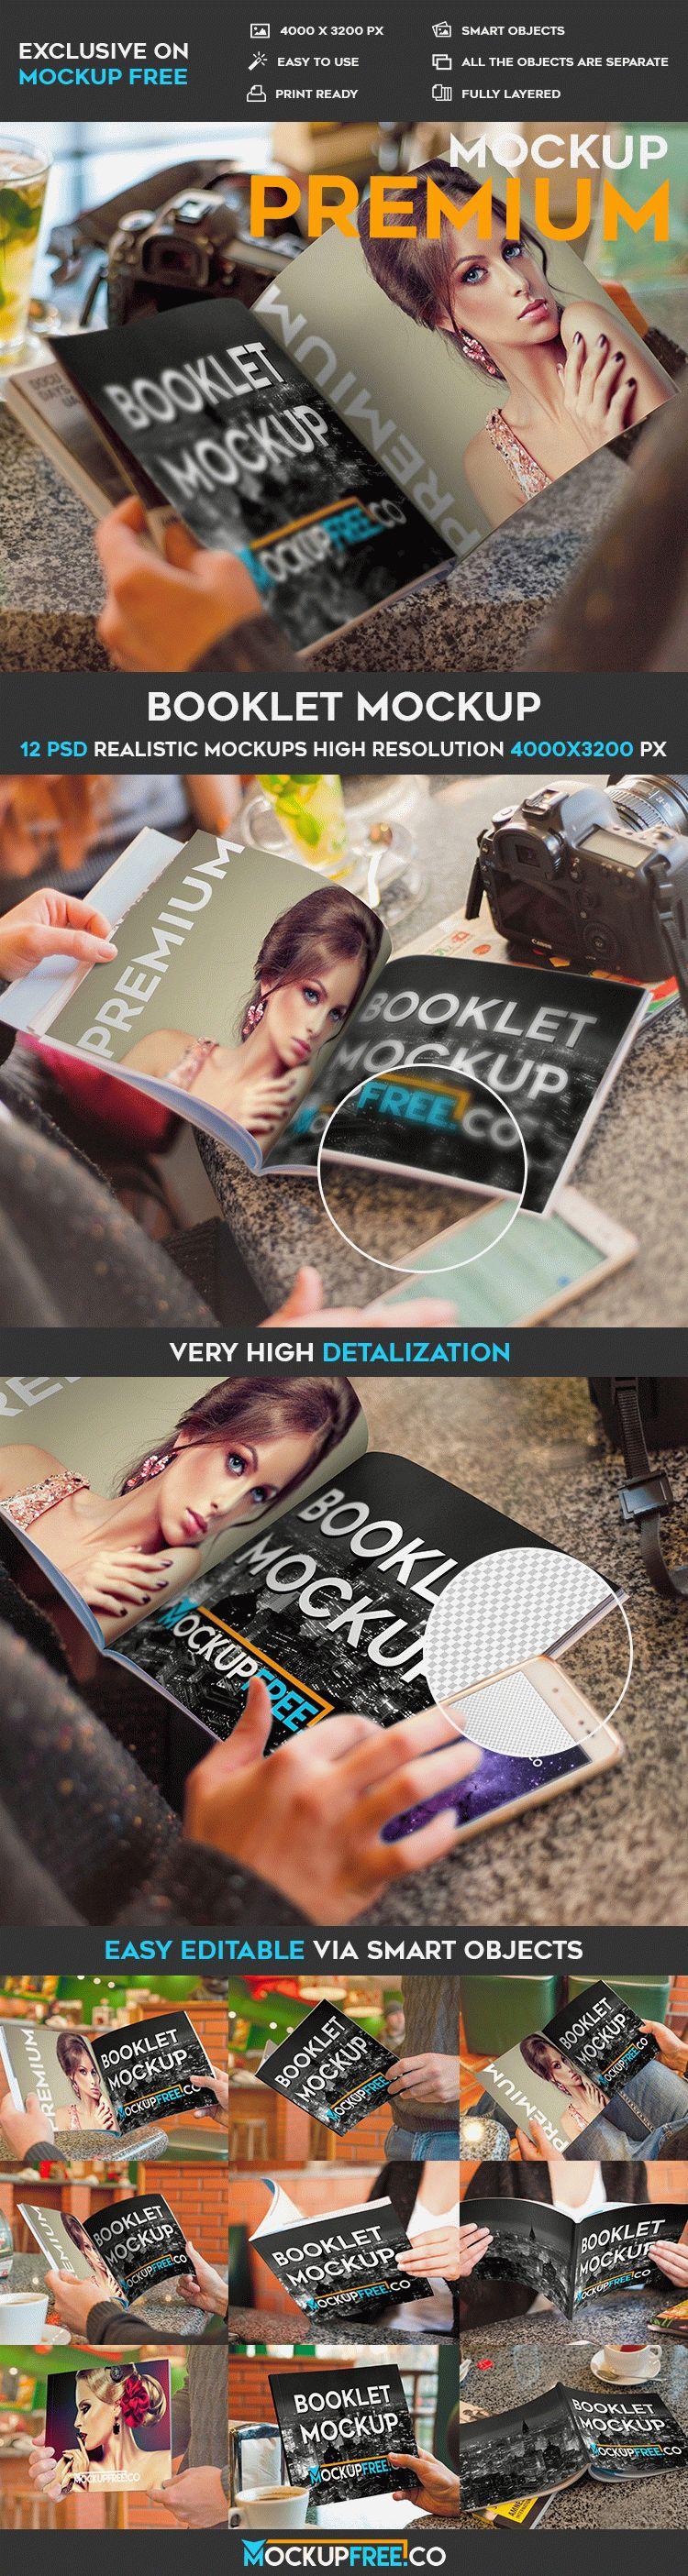 bigpreview_booklet-12-premium-psd-mockups